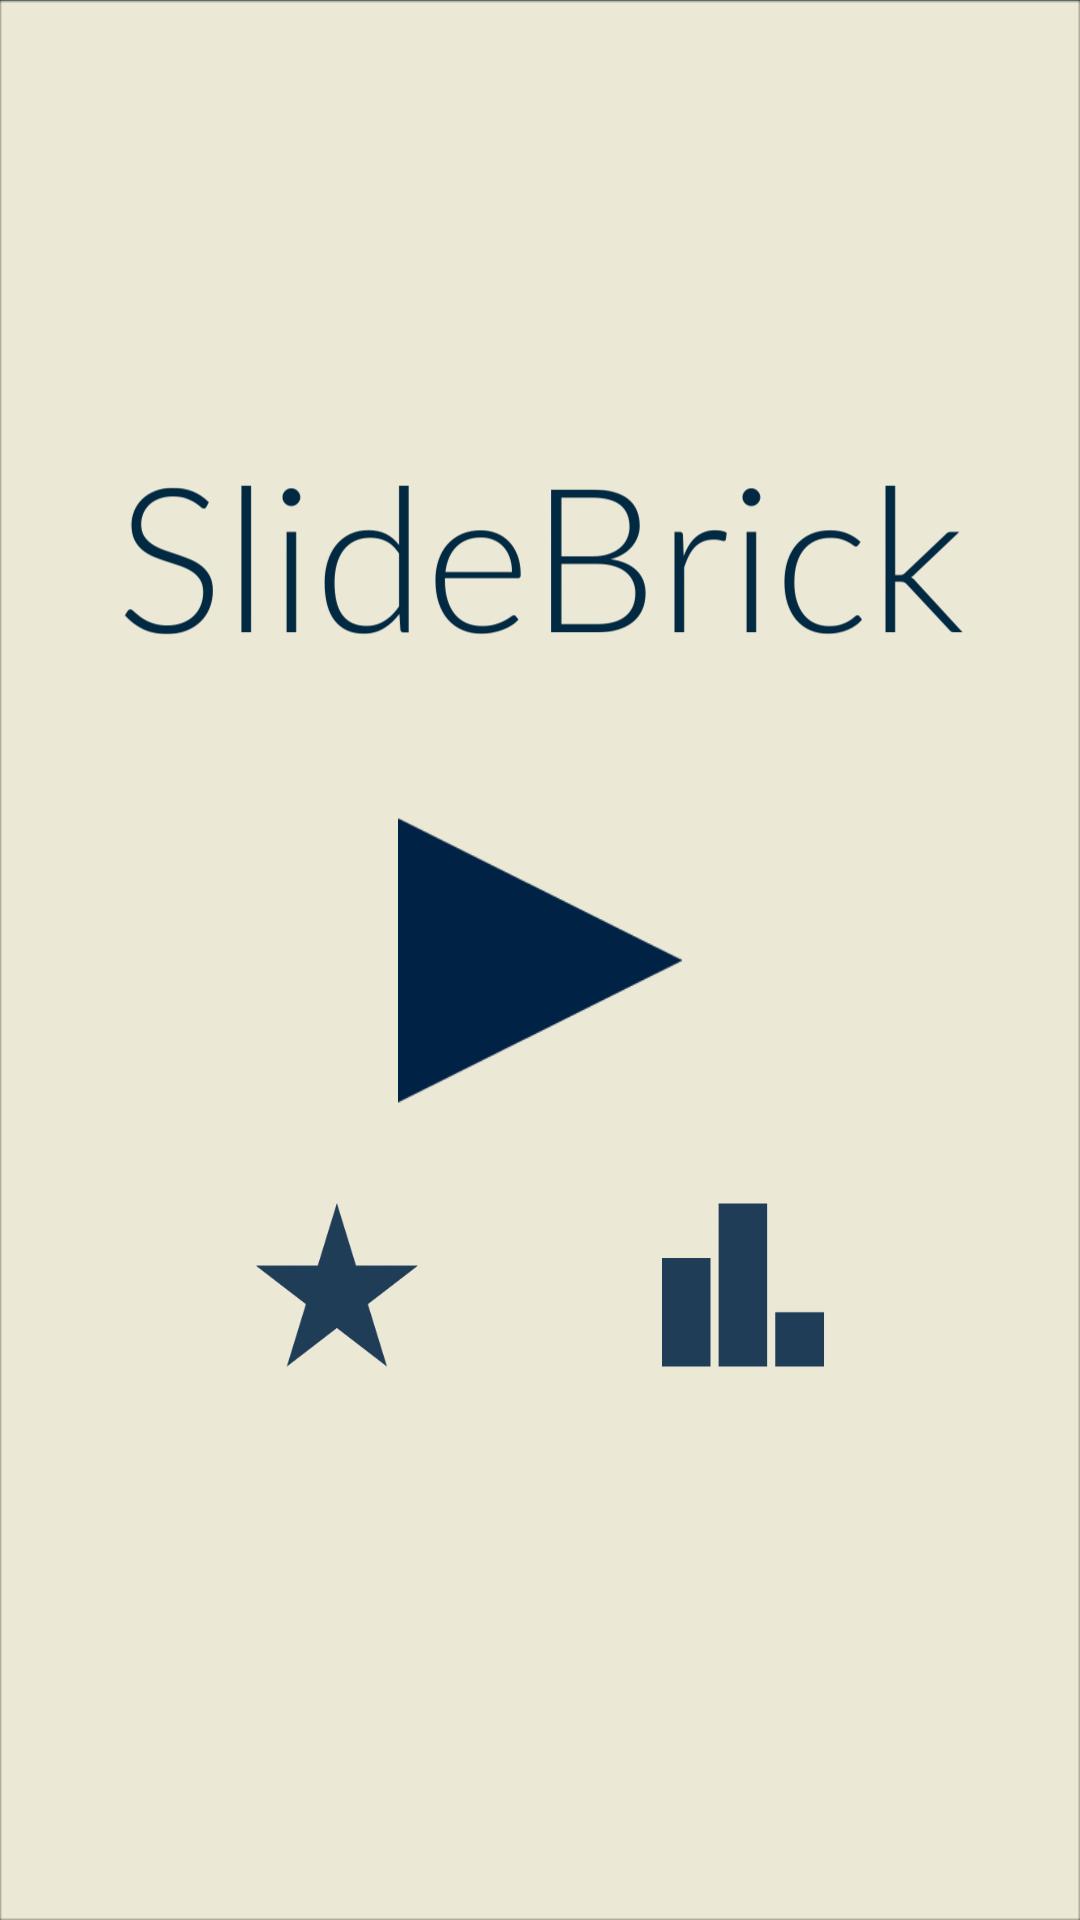 slidebrick-1